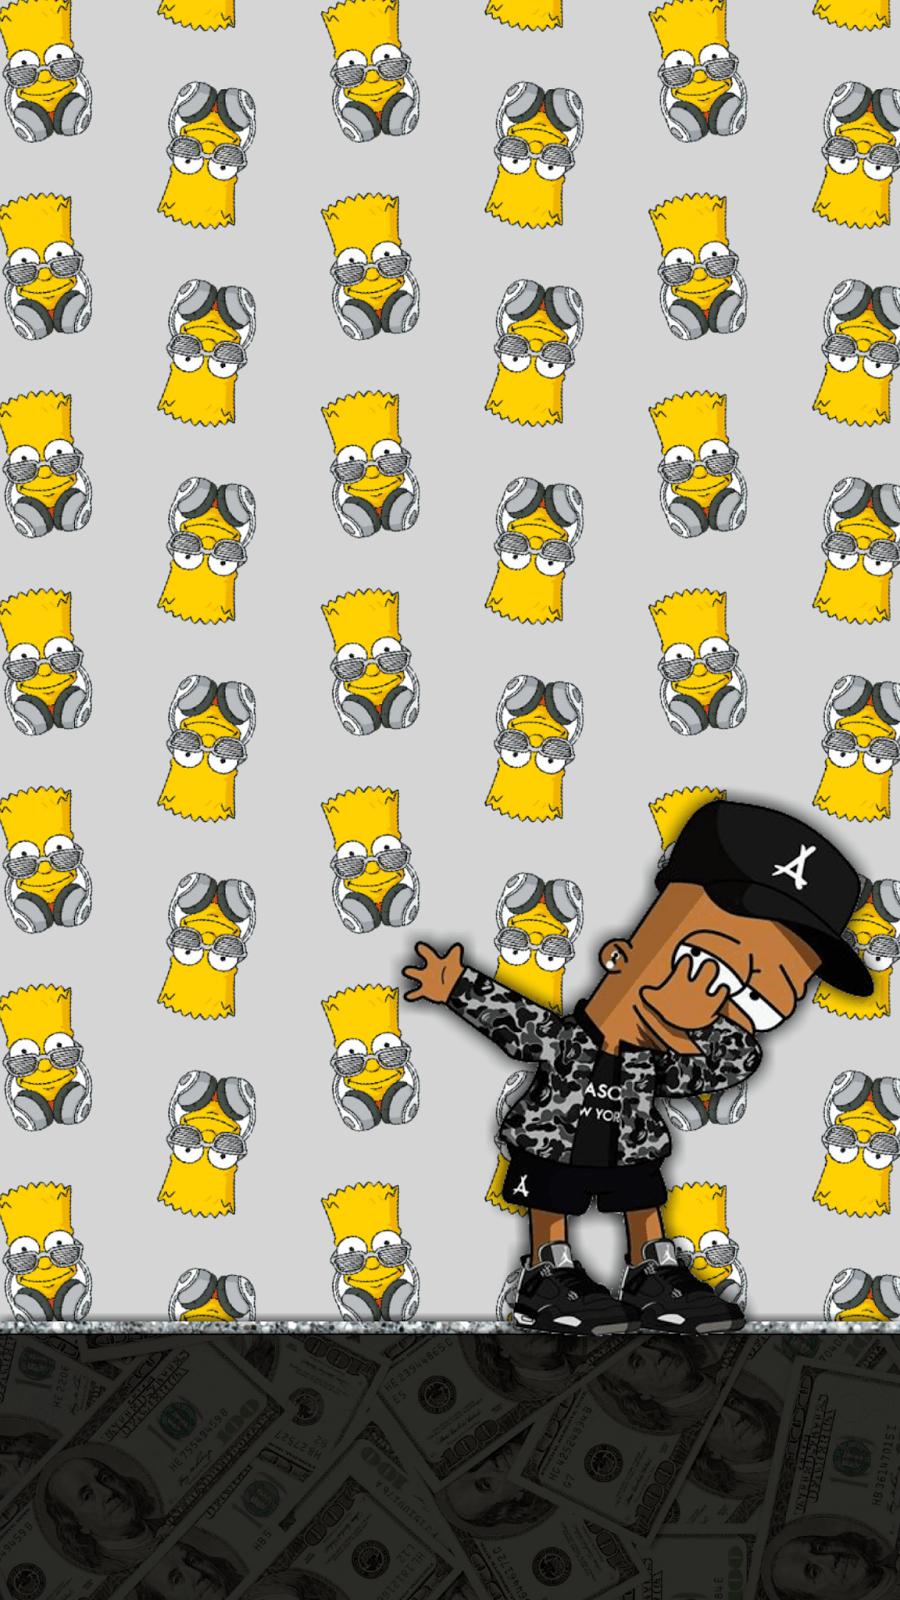 Supreme Bart Simpson Wallpapers - Top Free Supreme Bart ...